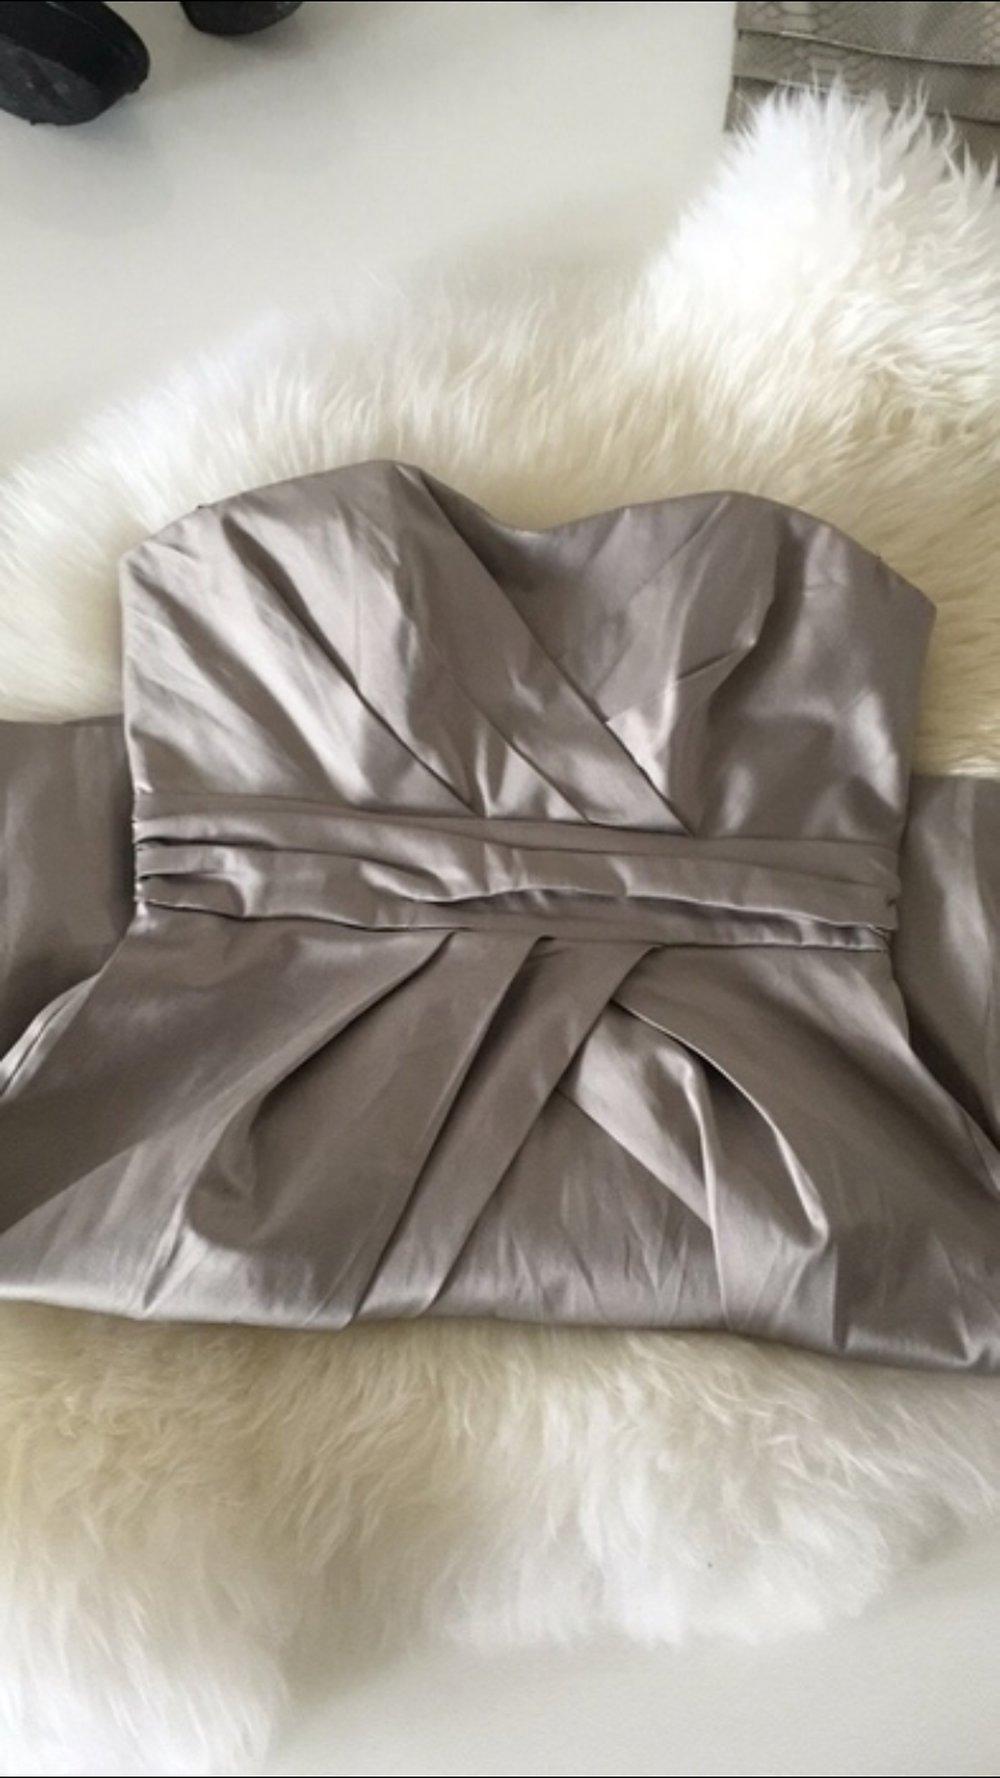 08903f802cf43e Atmosphere - Graues Kleid 36 S Partykleid :: Kleiderkorb.de